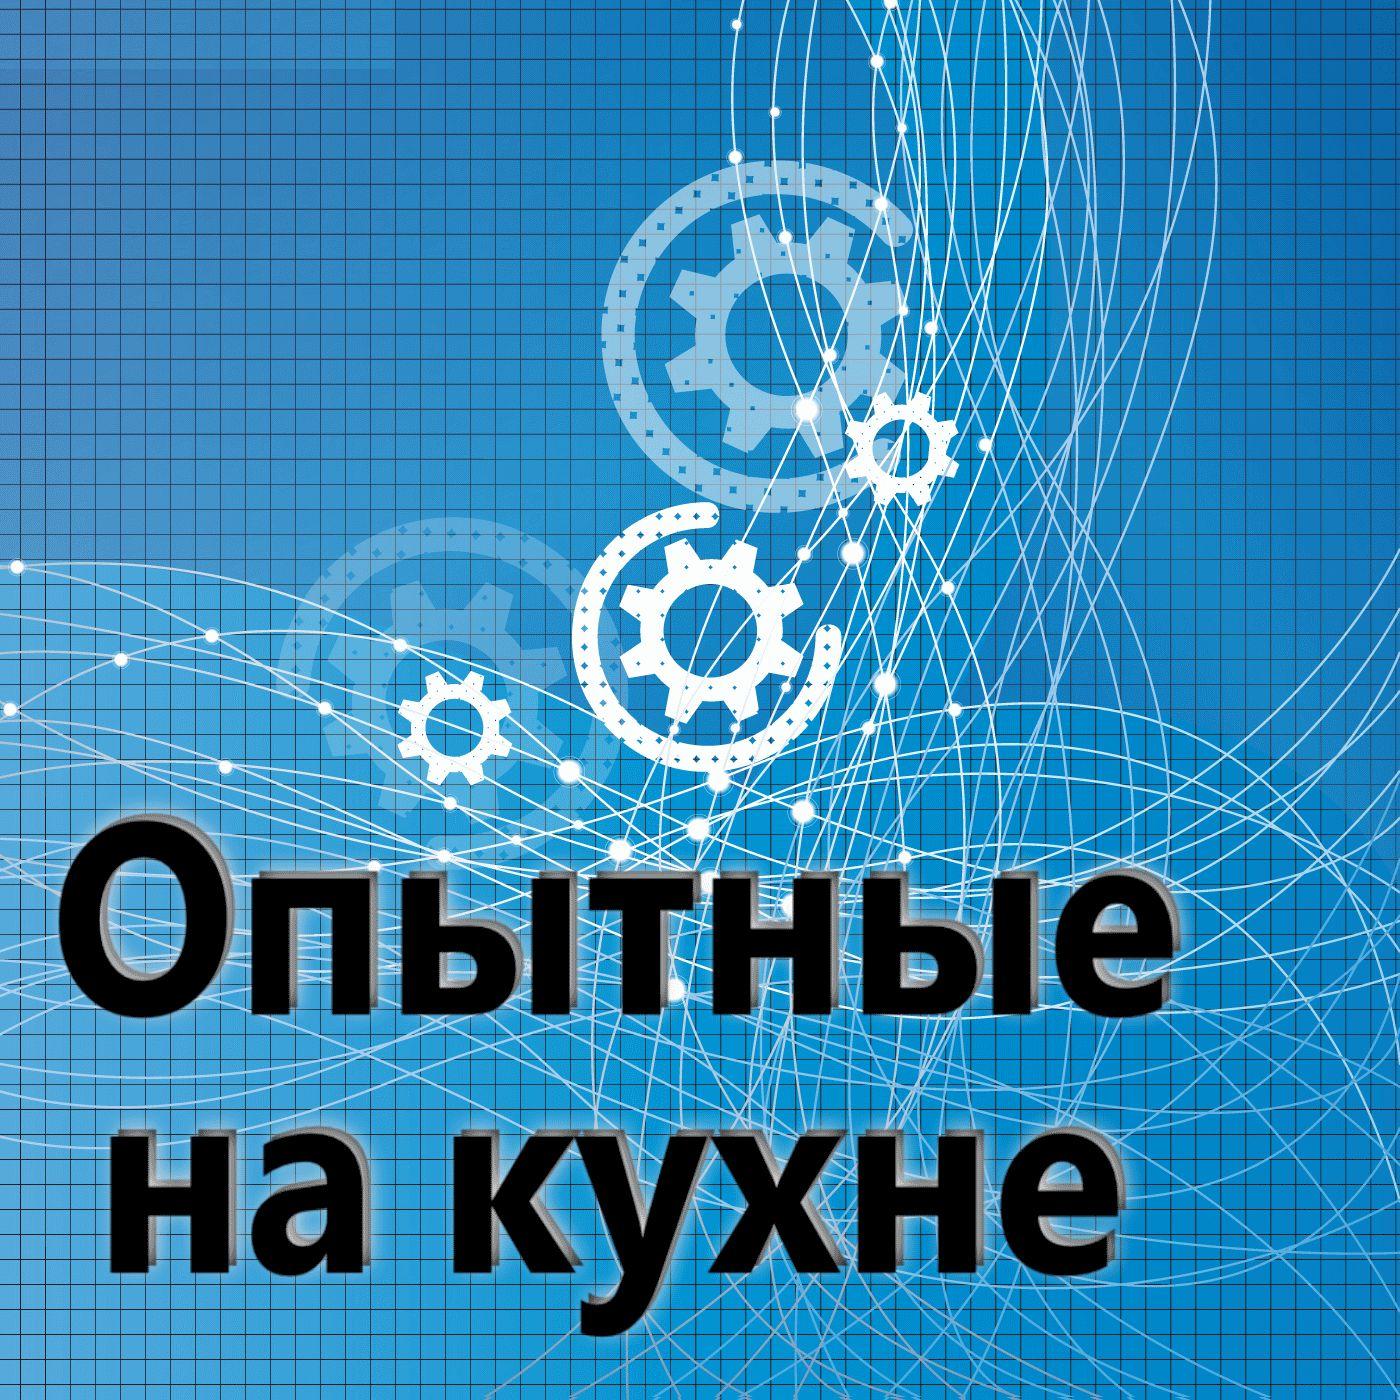 Евгений Плешивцев Опытные кухне №030